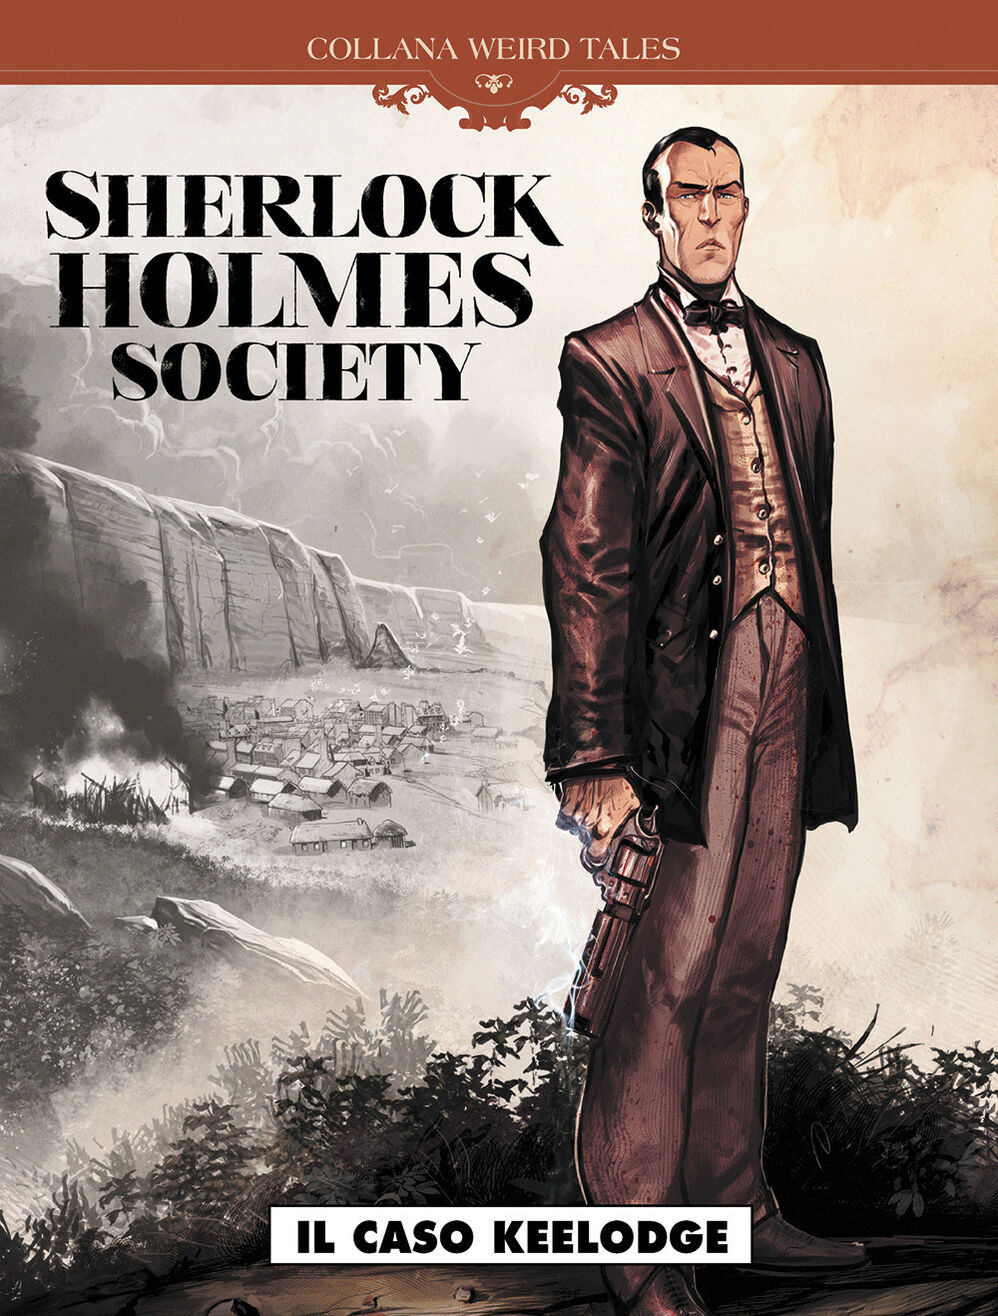 Il caso Keelodge. Sherlock Holmes society. Vol. 1